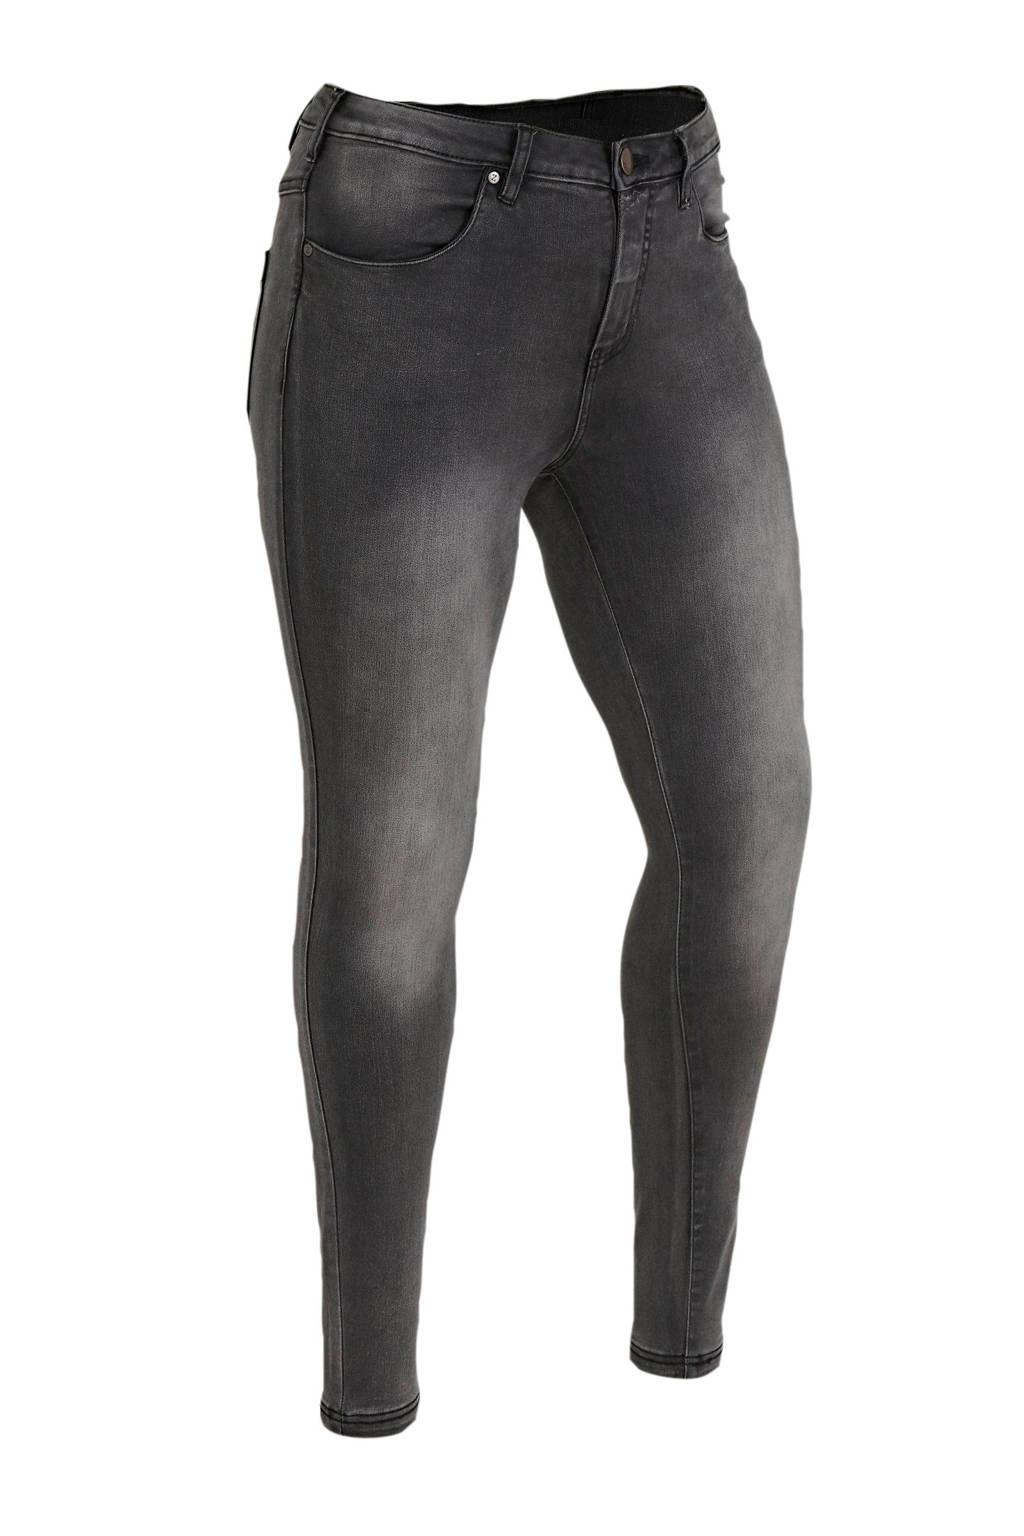 Zizzi high waist skinny jeans grijs lengtemaat 34, Antraciet stonewashed